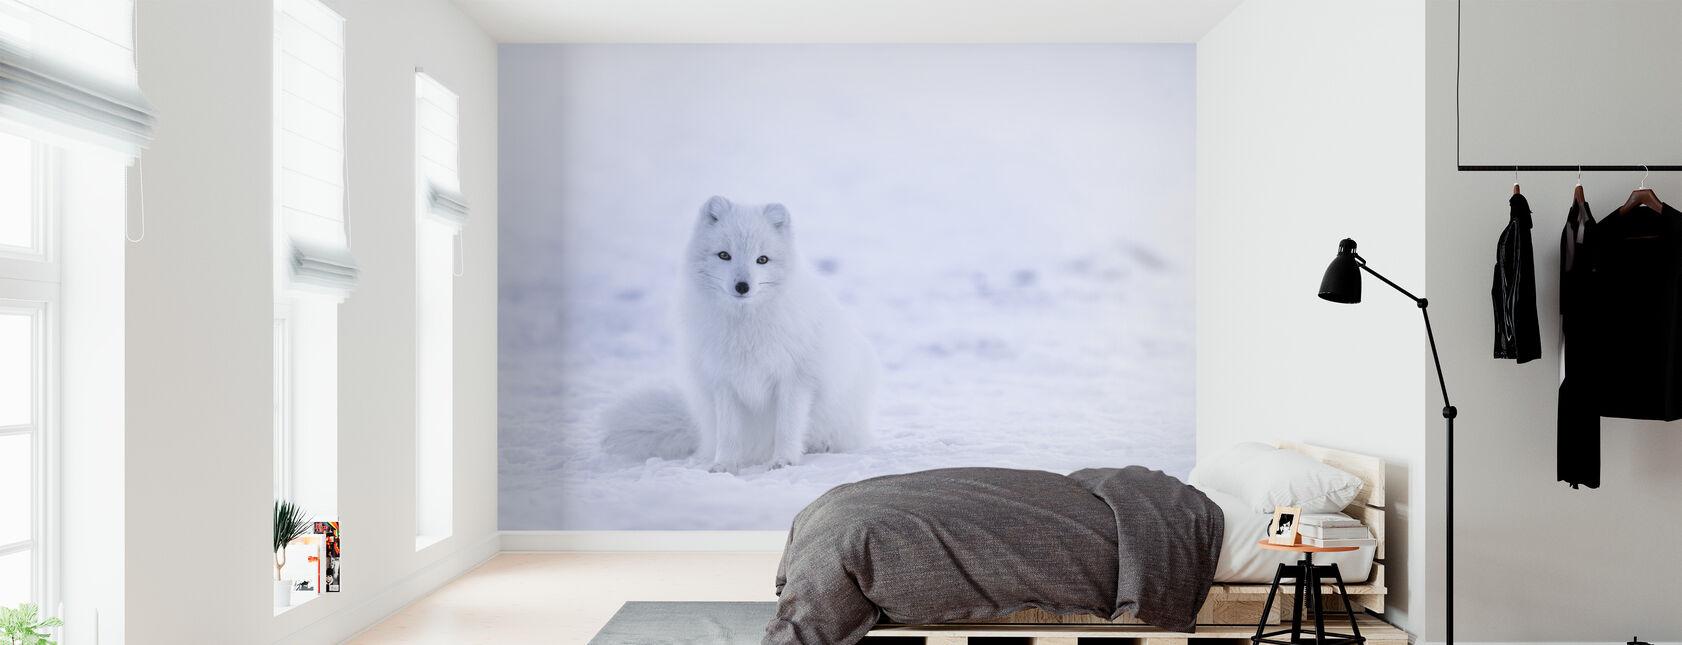 Artic Fox - Wallpaper - Bedroom